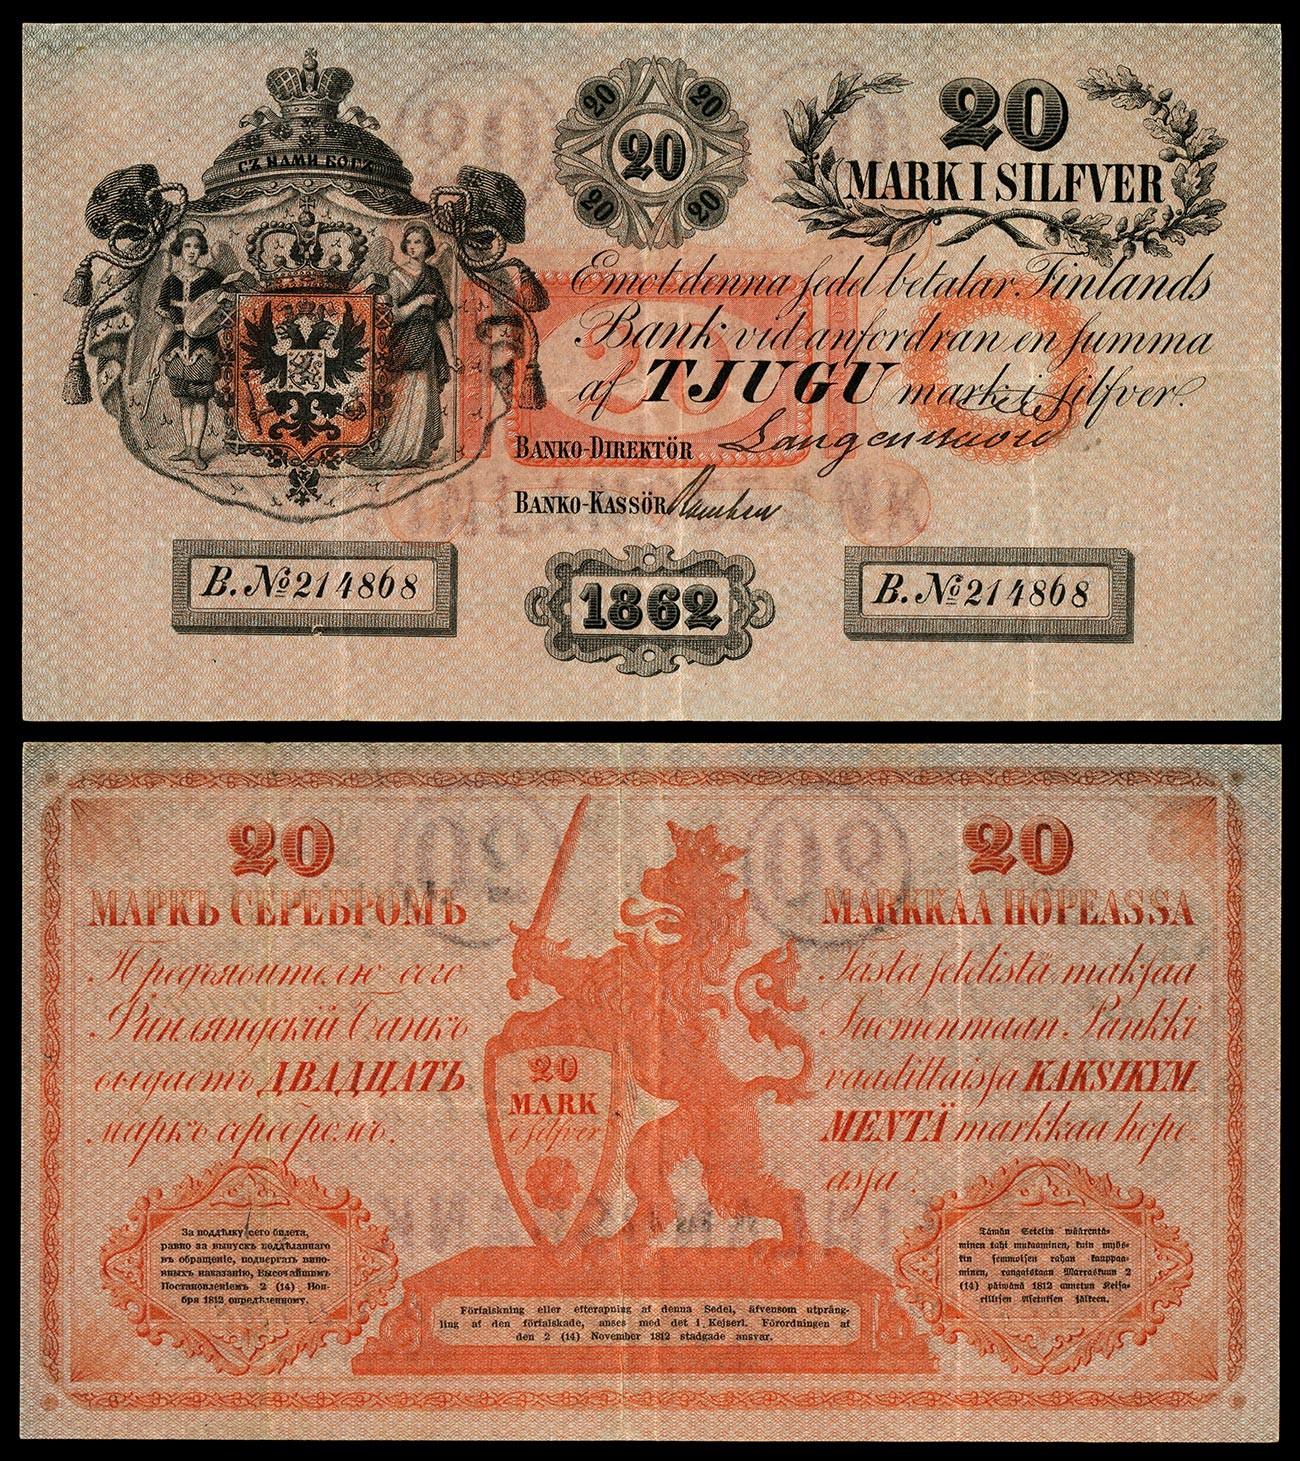 Billete de markka finlandés (1862)